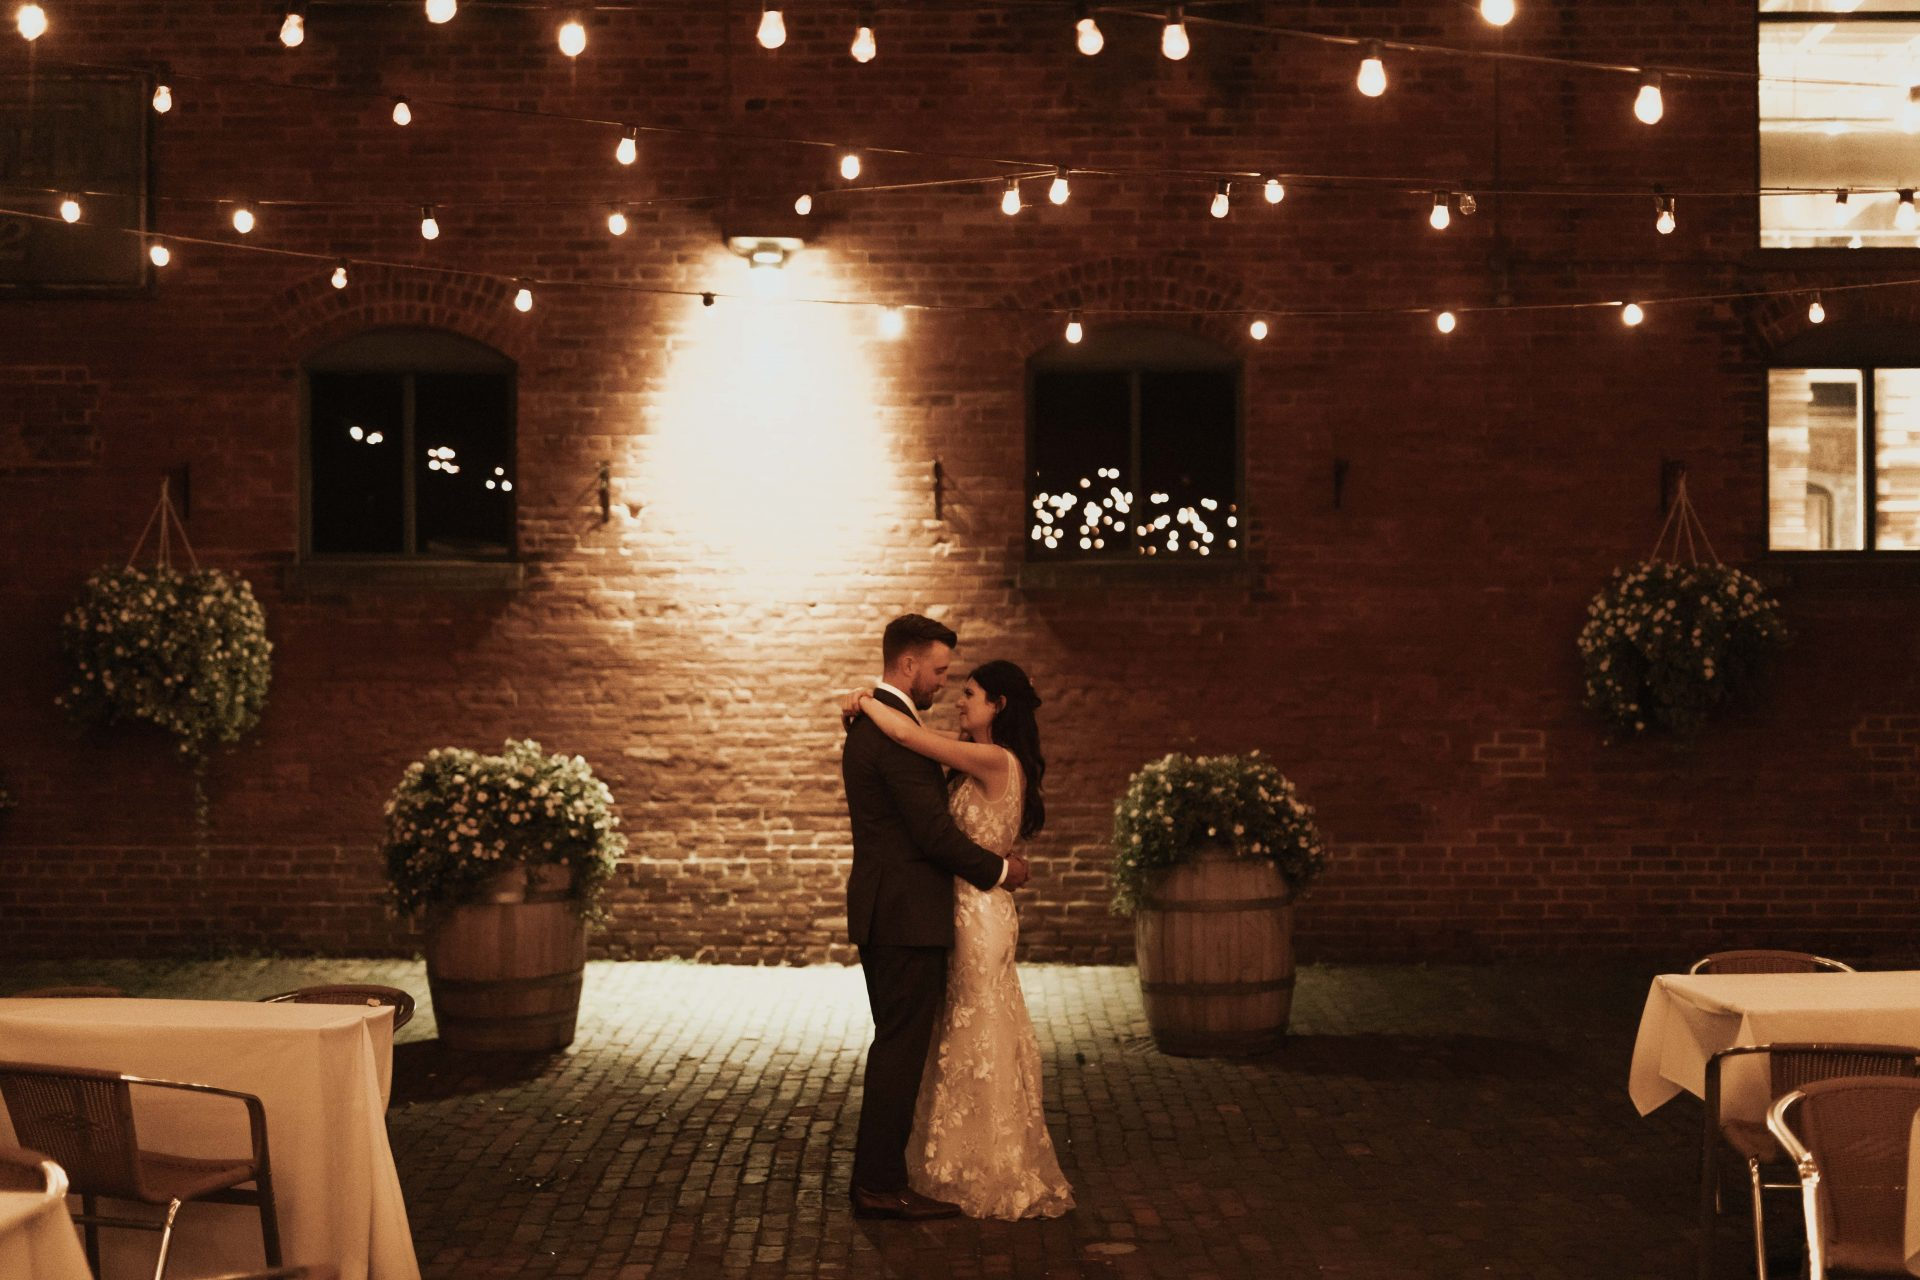 distillery district night bride and groom photos